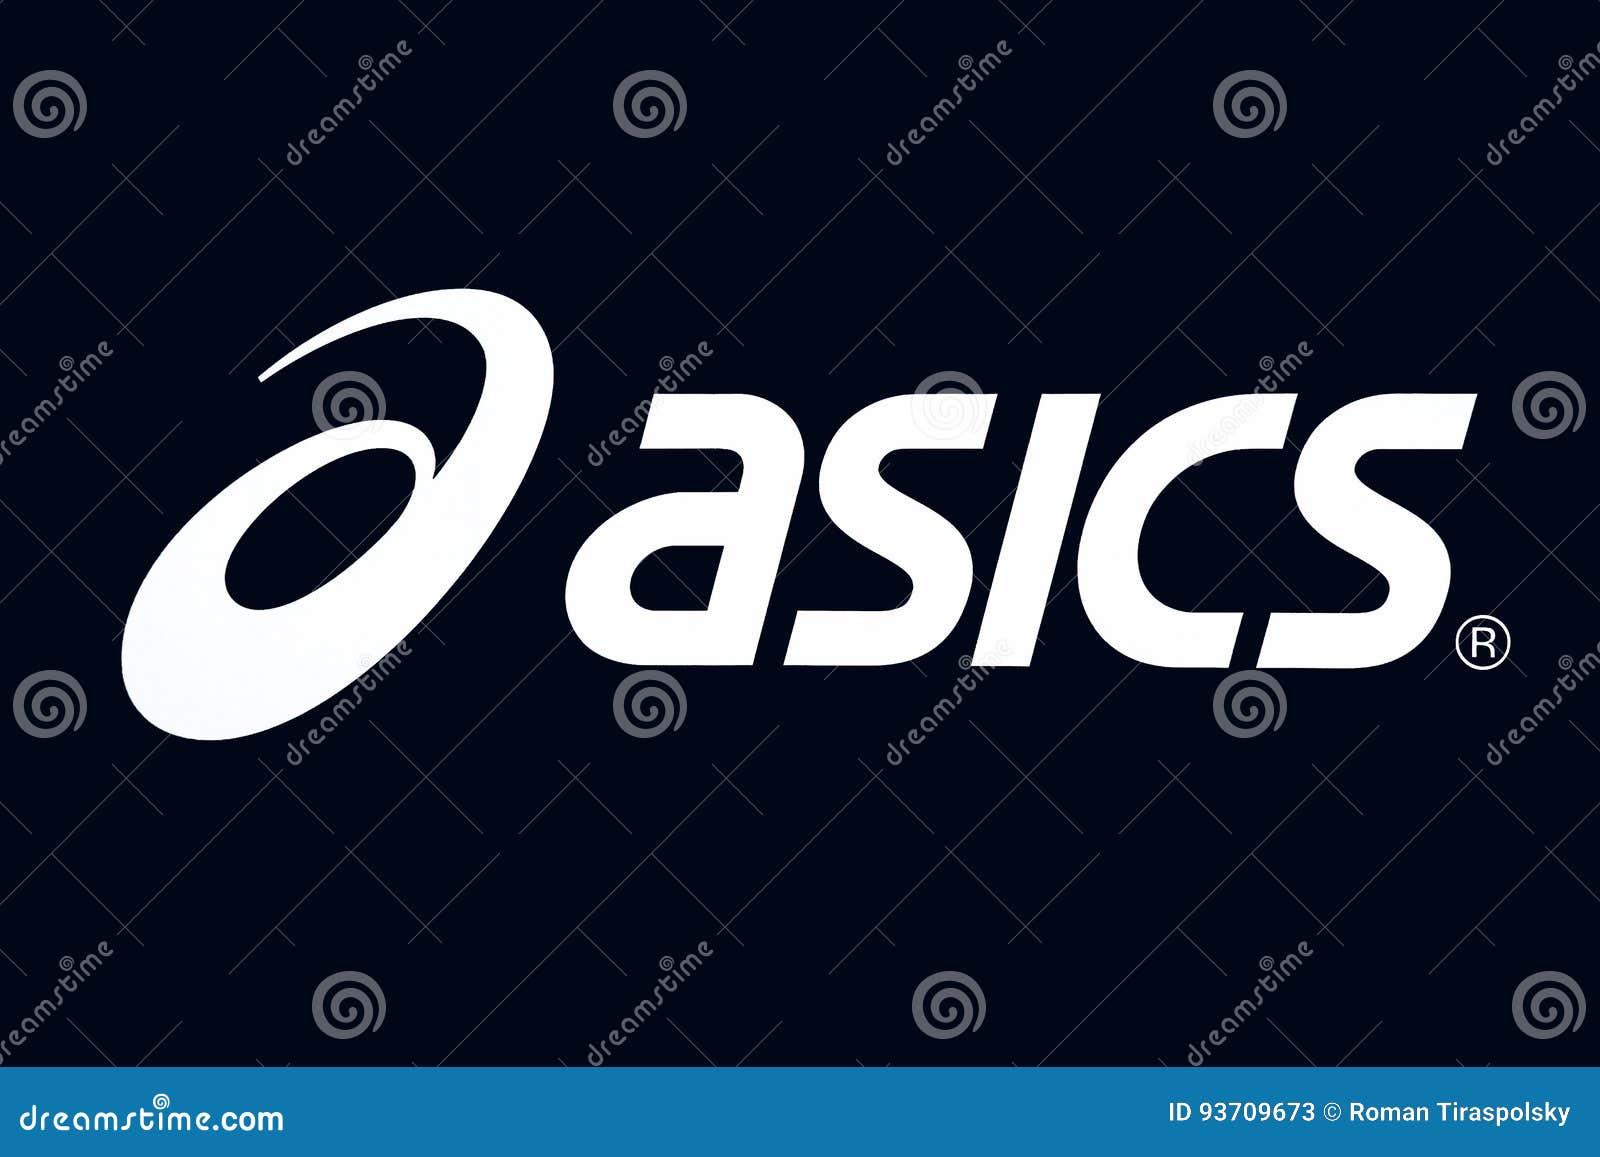 Asics logo editorial stock photo image of dark emblem 93709673 asics logo editorial stock photo buycottarizona Images